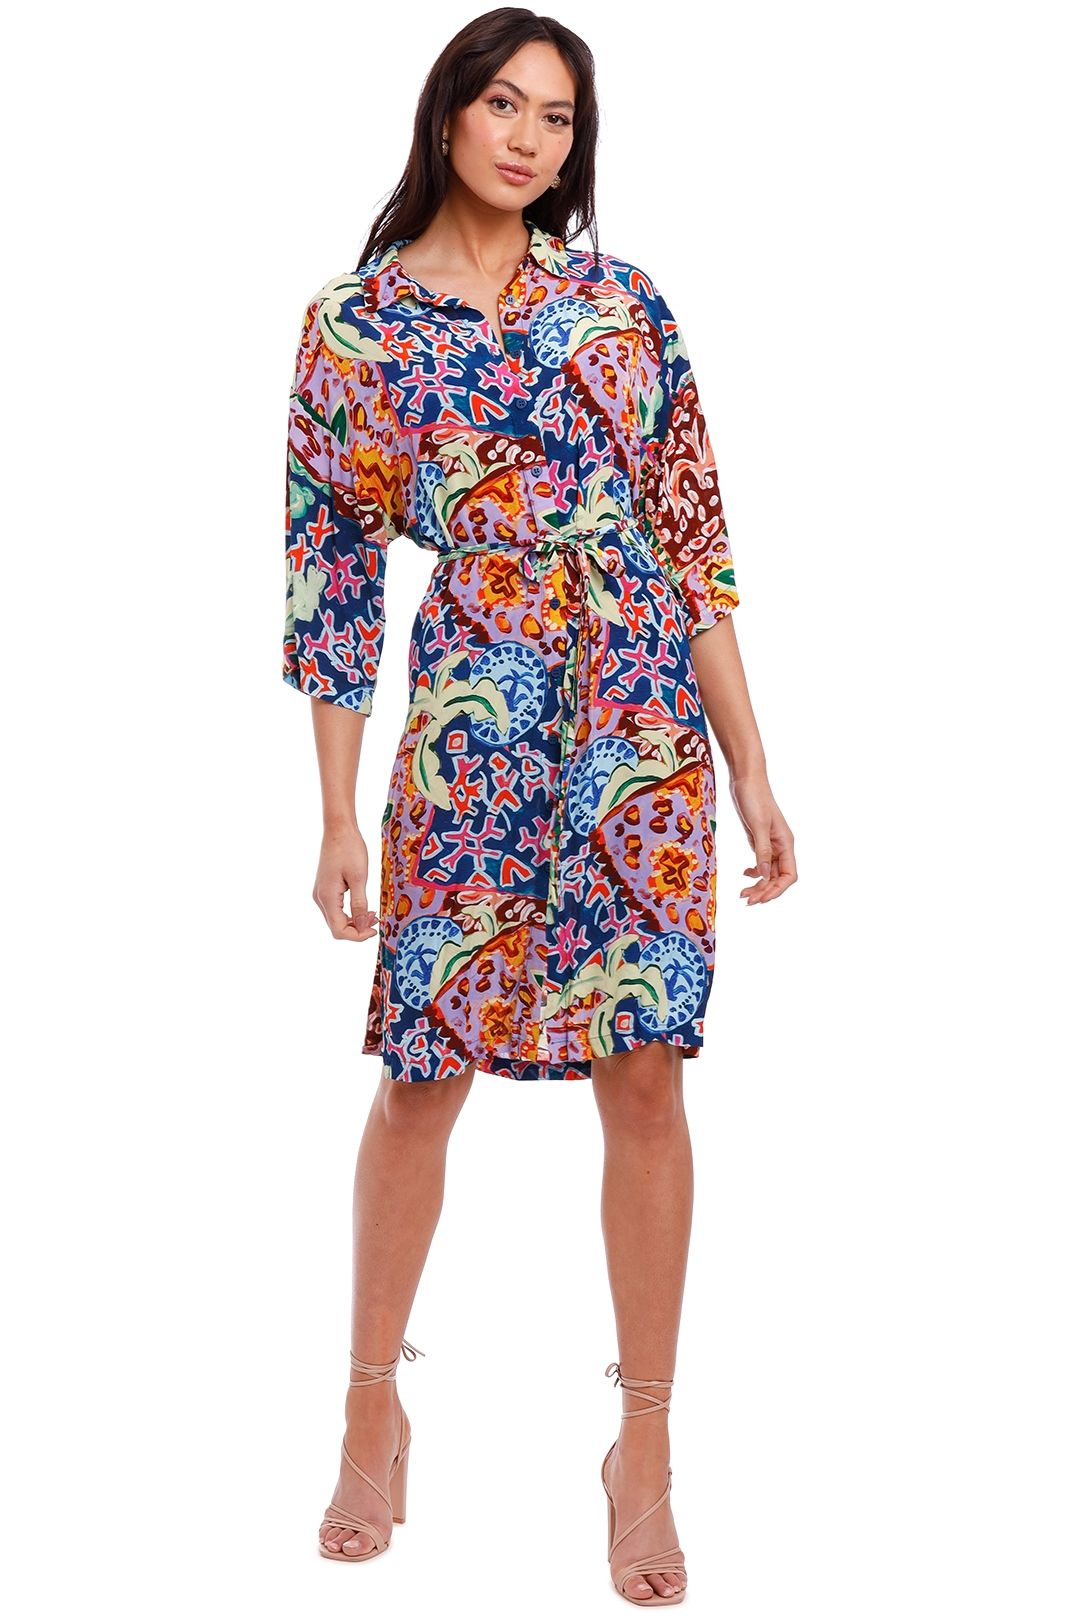 Gorman Paradiso Dress